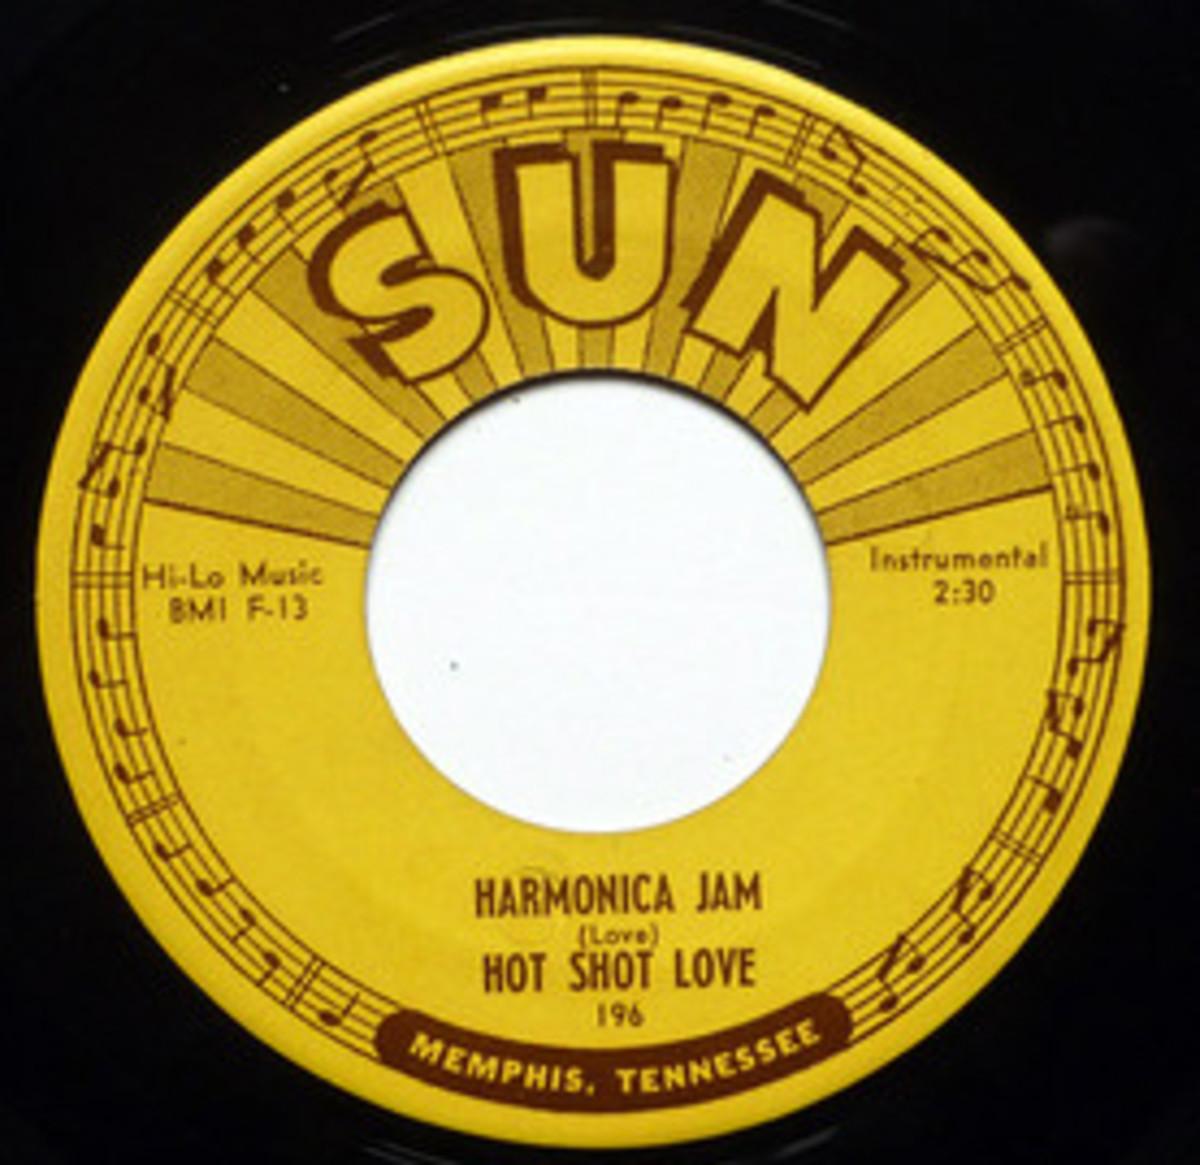 Hot Shot Love Harmonica Jam